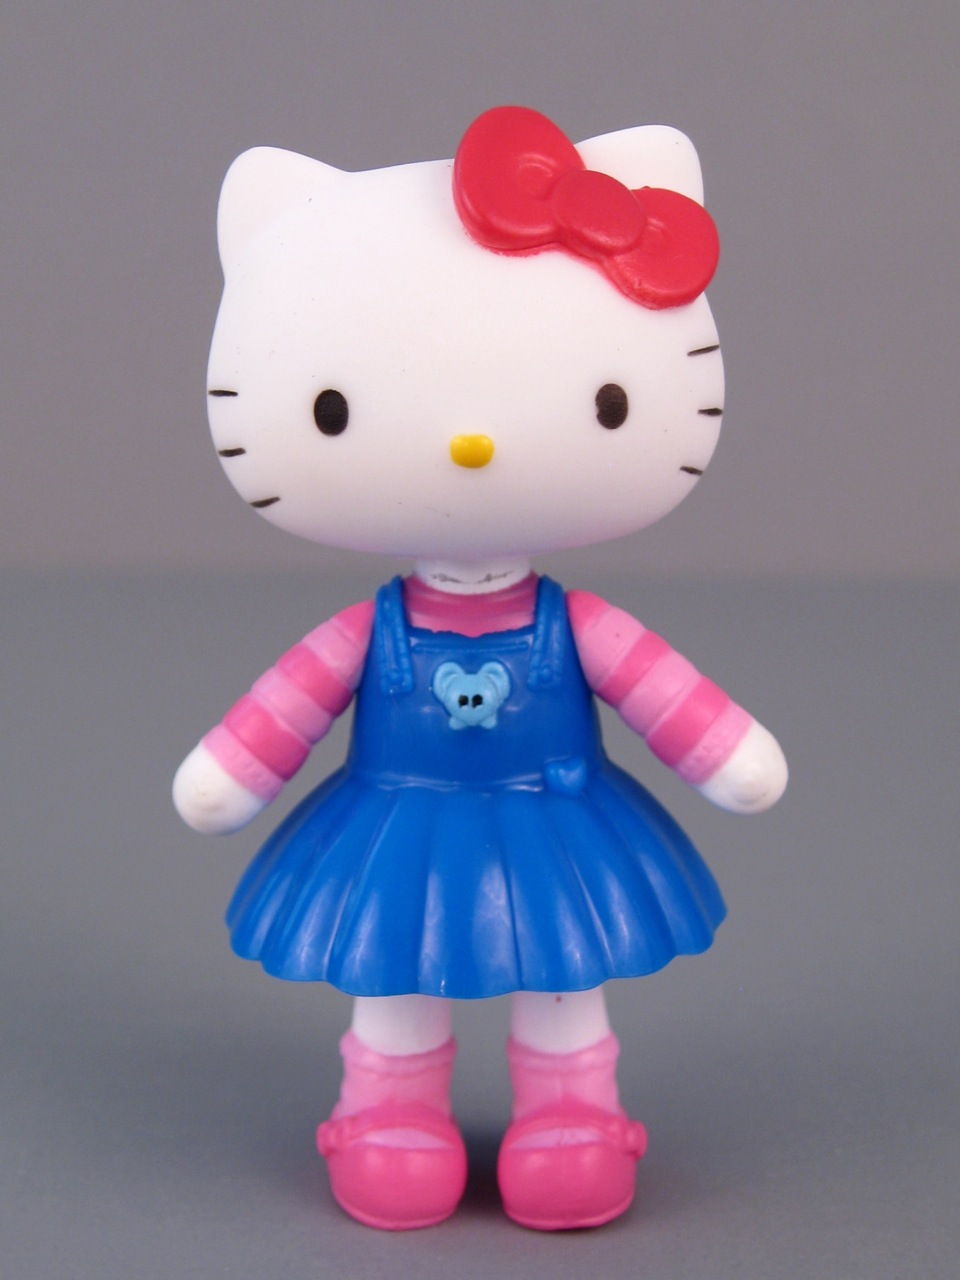 Toys For Hello Kitty : Hello kitty mini dolls from jada toys and blip the